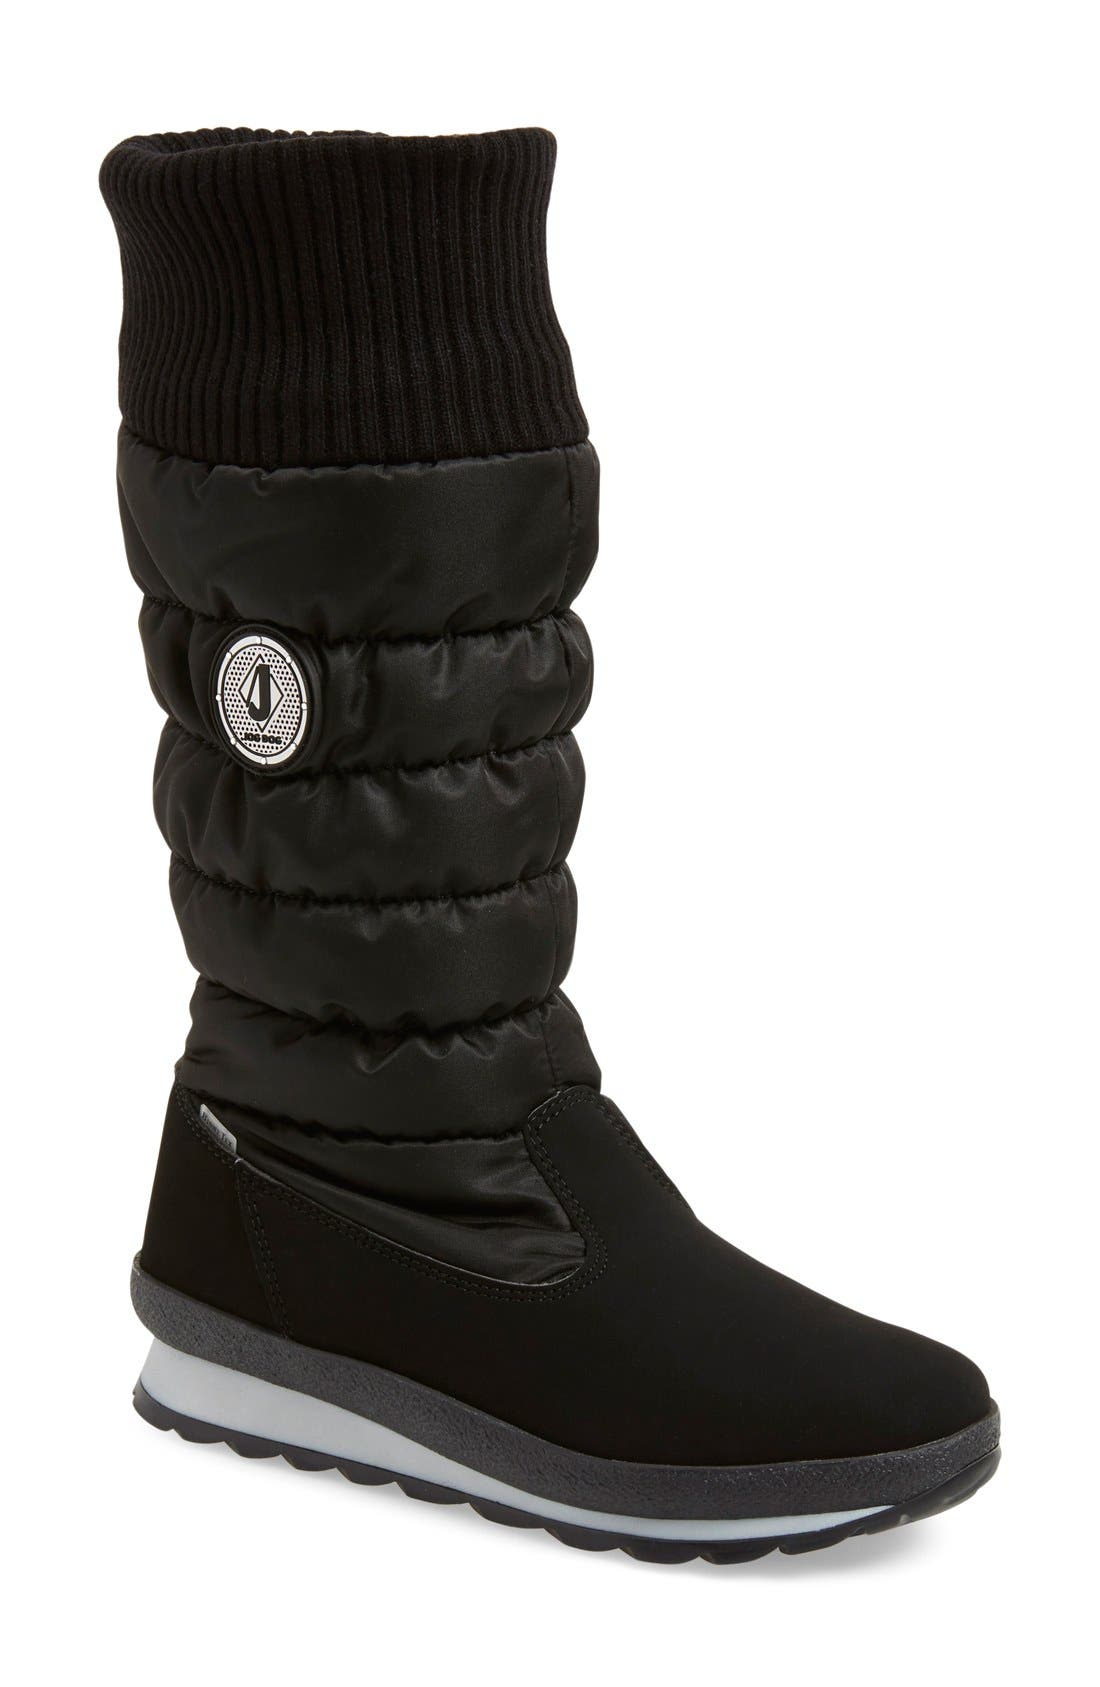 Main Image - JOG DOG St. Anton Waterproof Winter Boot (Women)